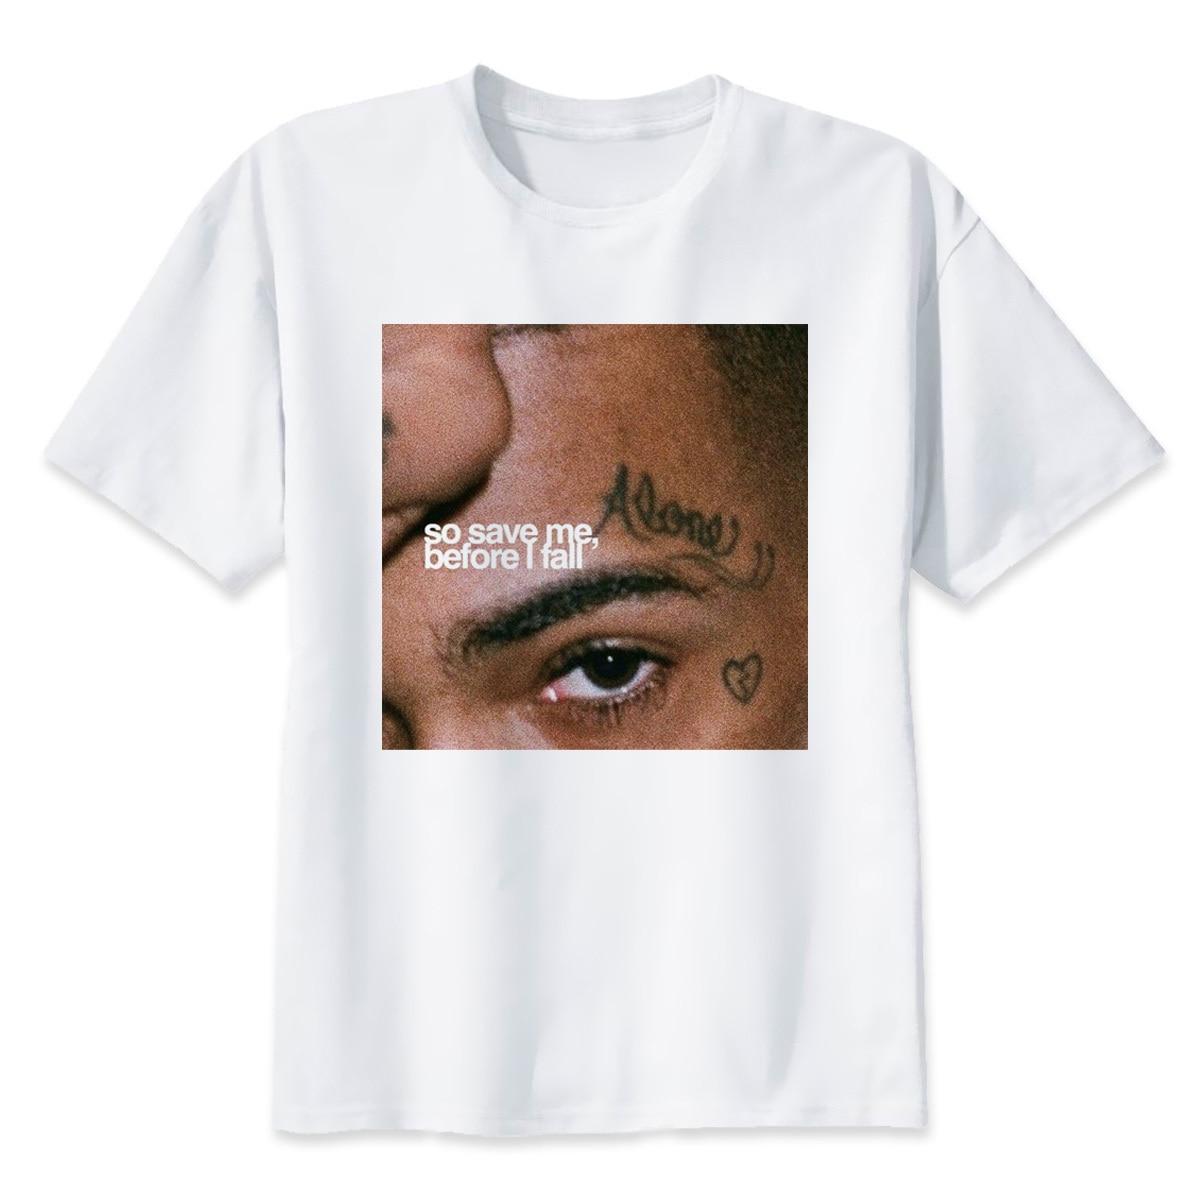 T  -  shirt   Men Hip Hop XXXtentacion Graphic Top Quality 100% Cotton S-XL   Shirts   men Rapper   T     Shirt   So save me Before I fall